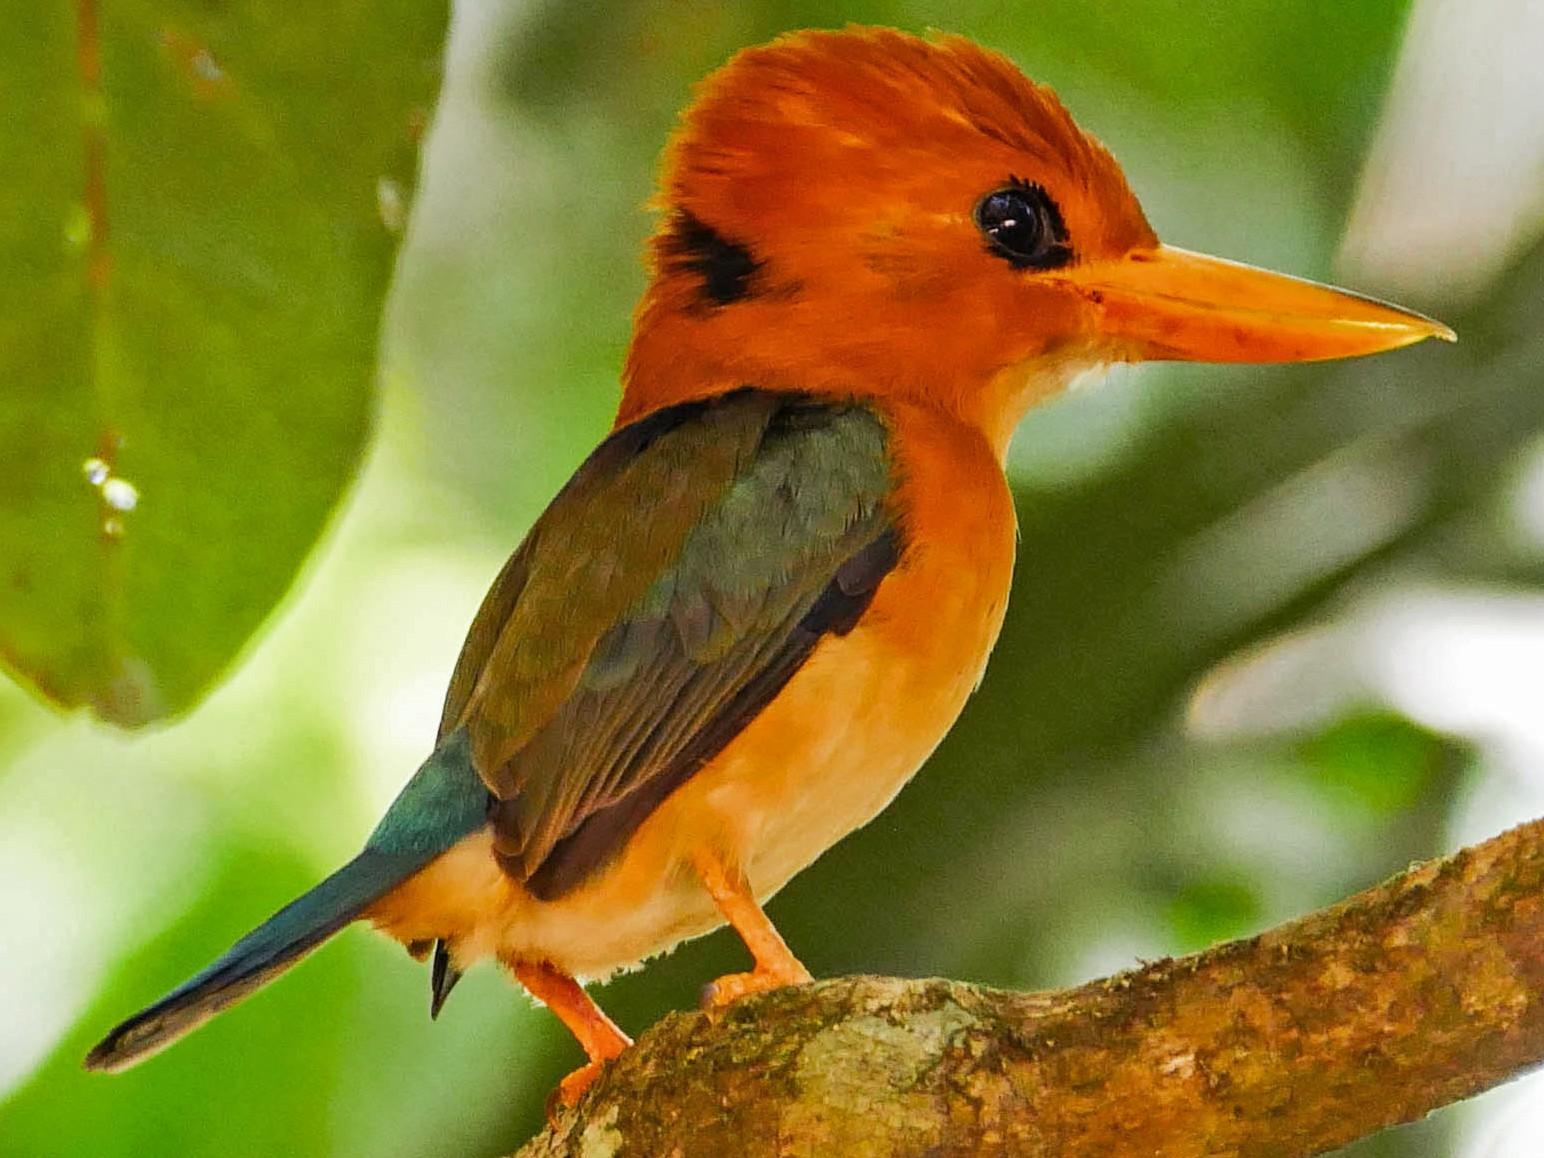 Yellow-billed Kingfisher - Nige Hartley